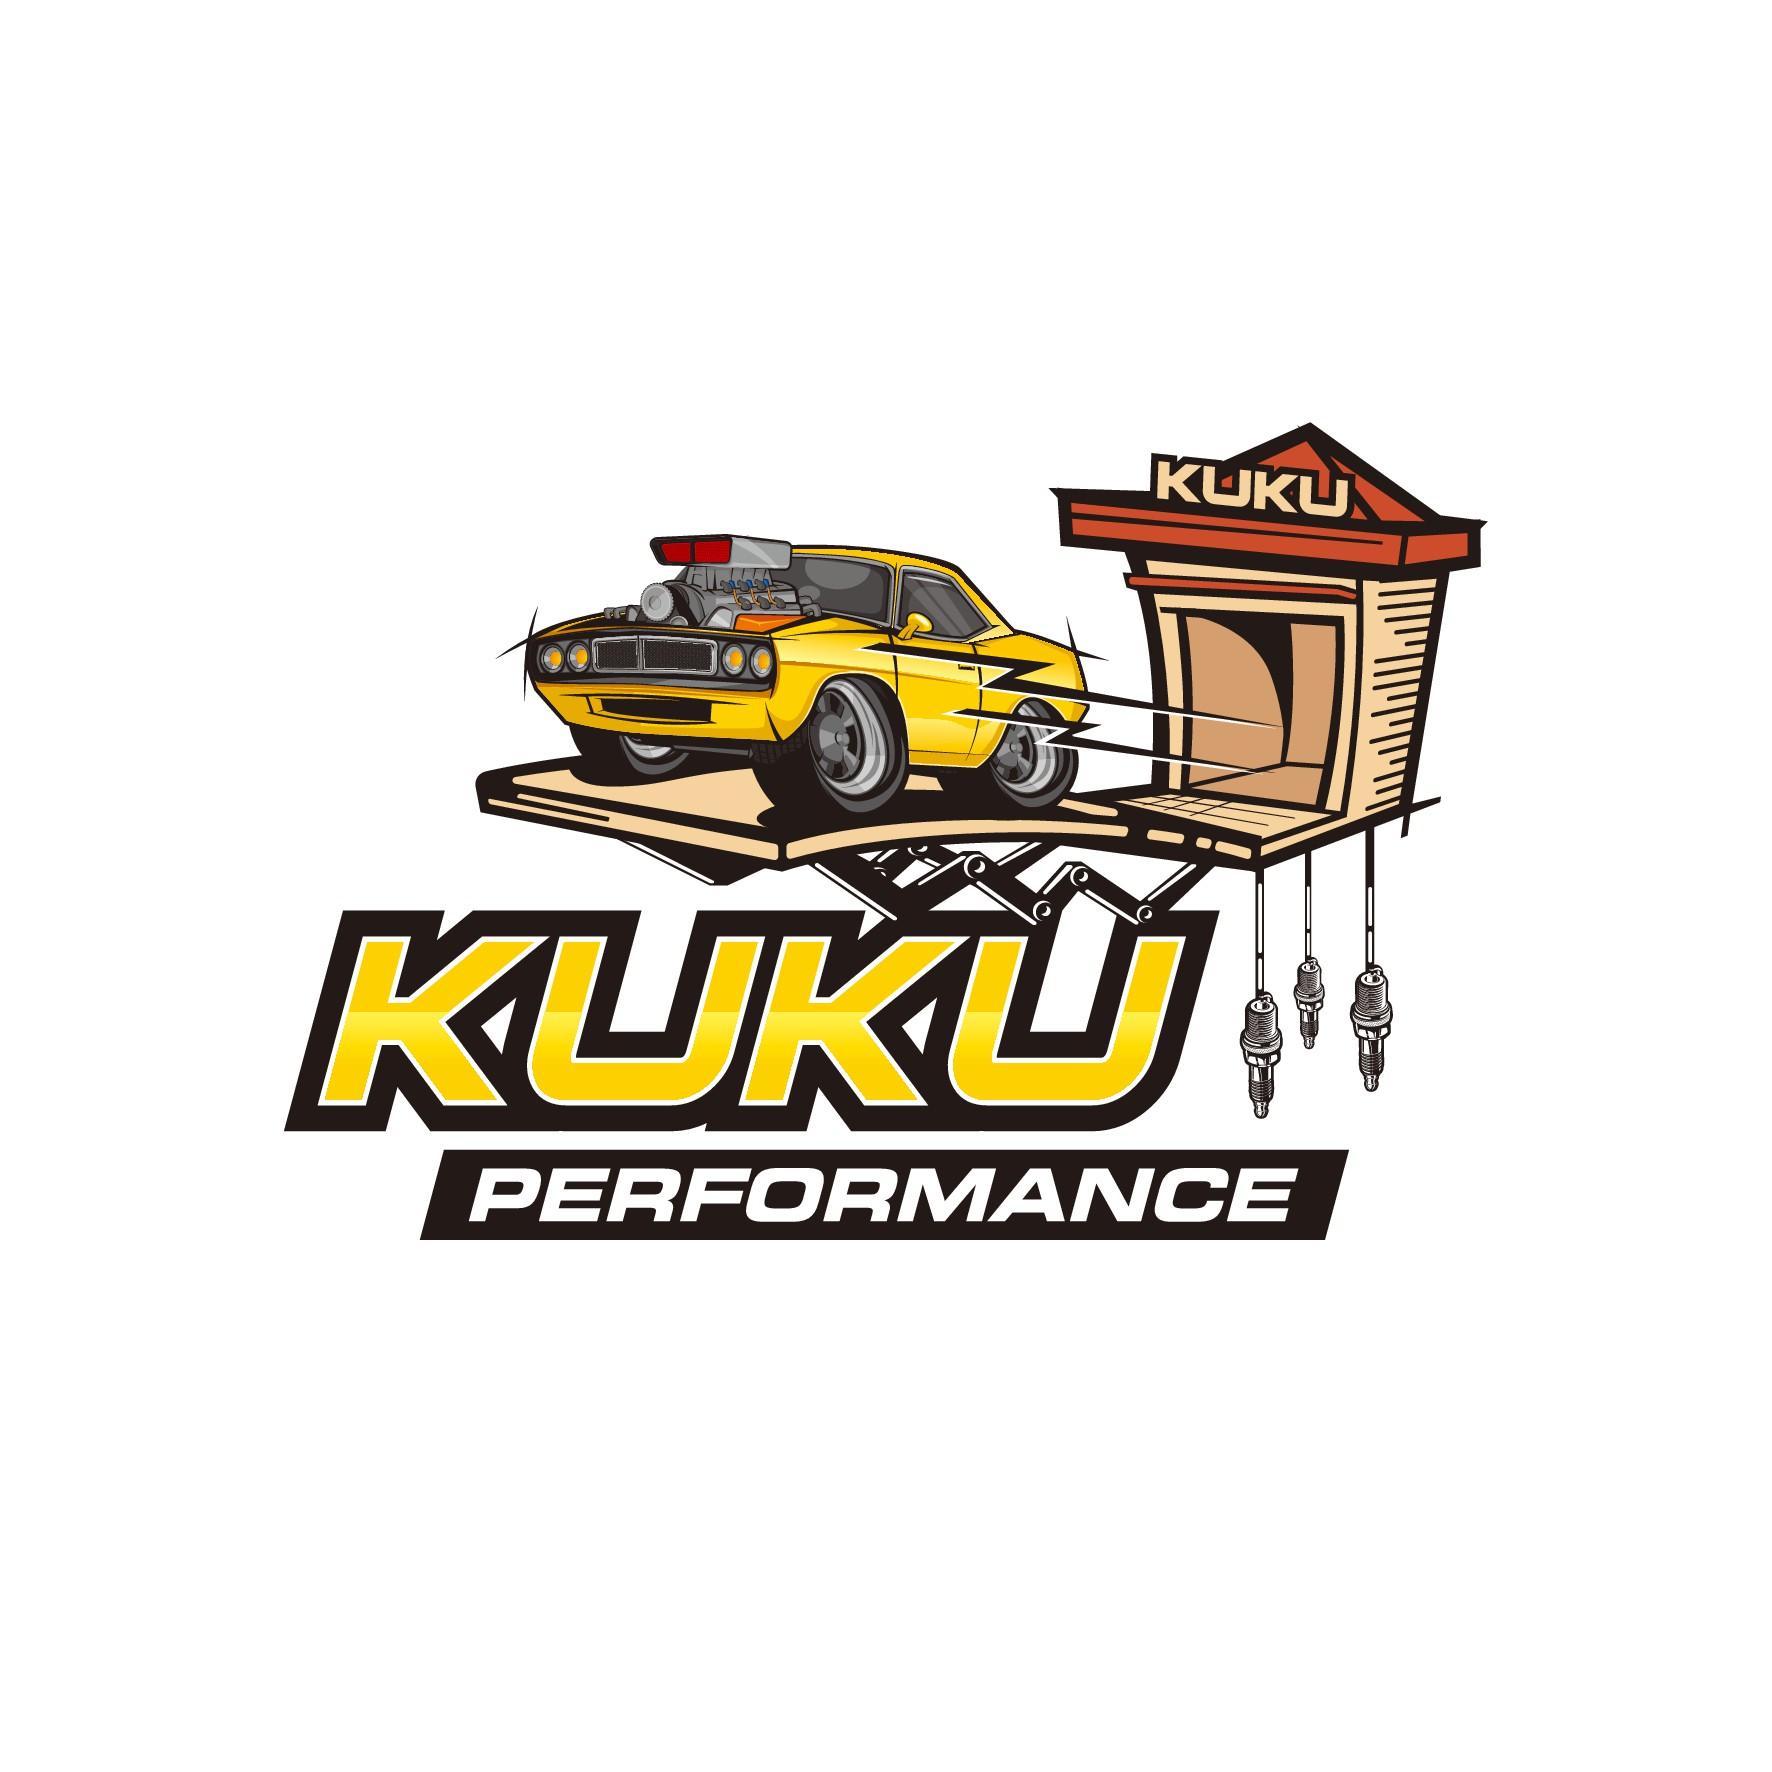 New unique custom parts business needs a creative logo